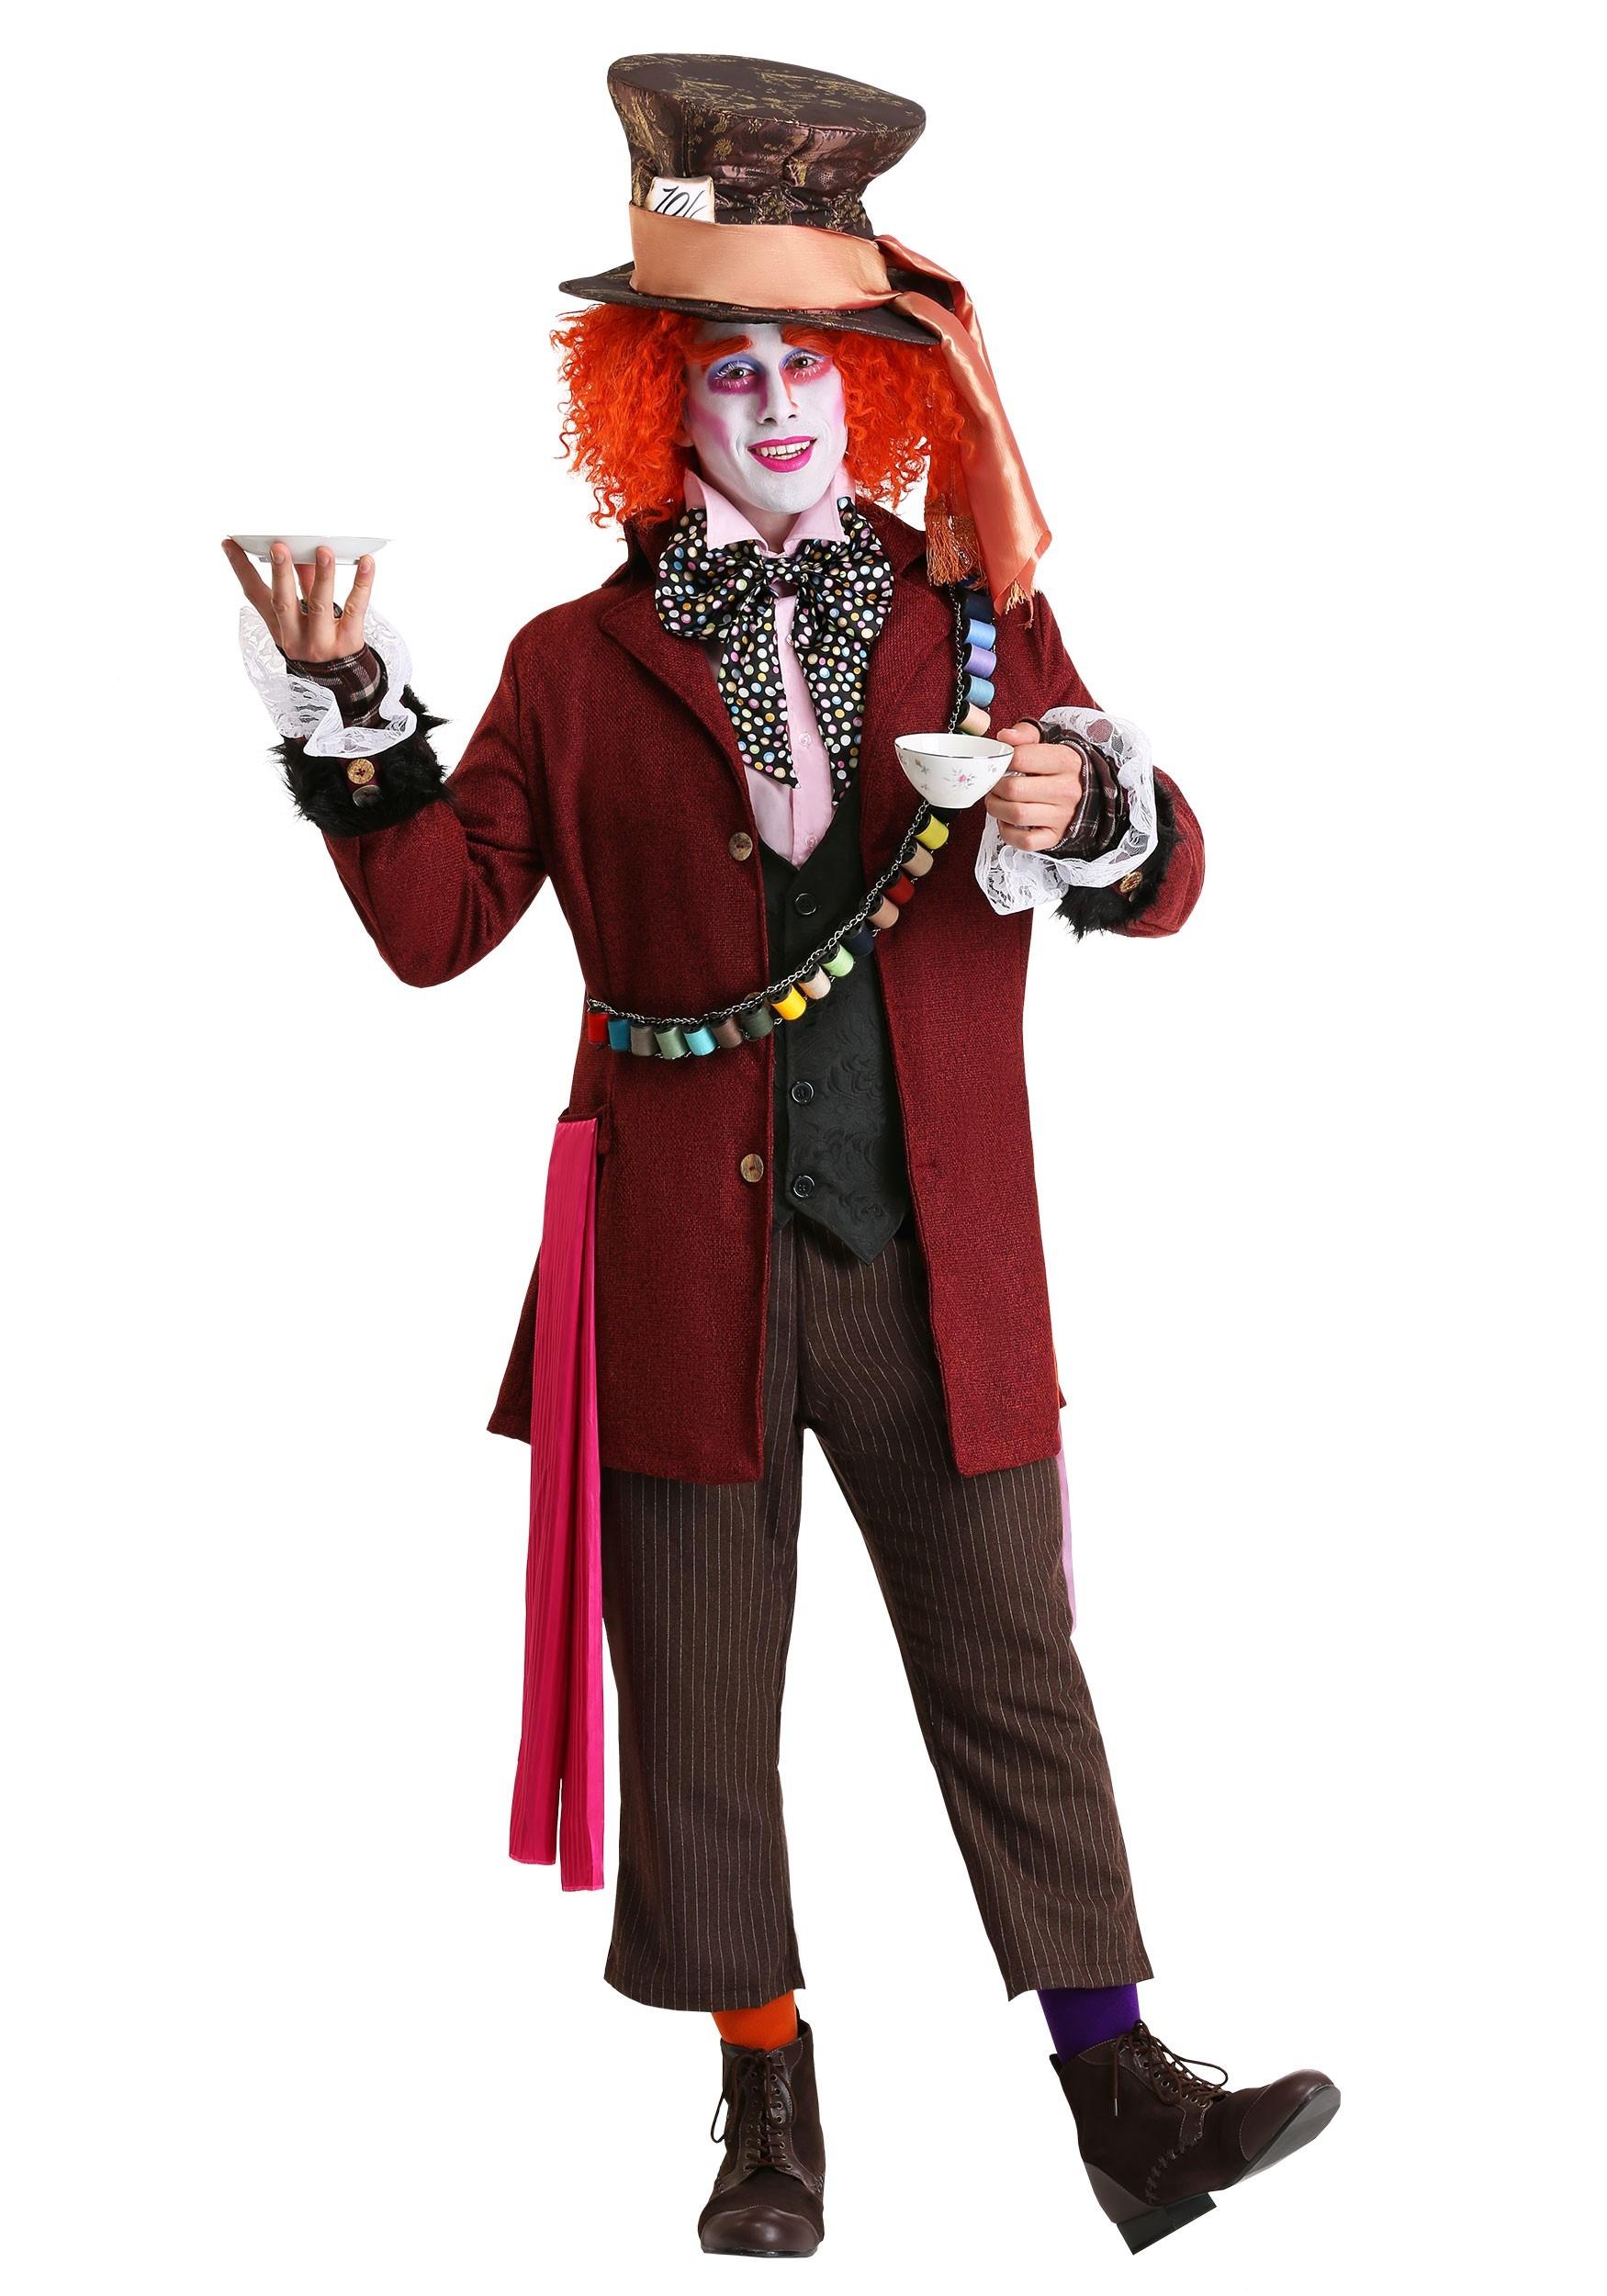 Authentic Mens Mad Hatter Costume - Johnny Depp Mad Hatter ... | 1750 x 2500 jpeg 344kB